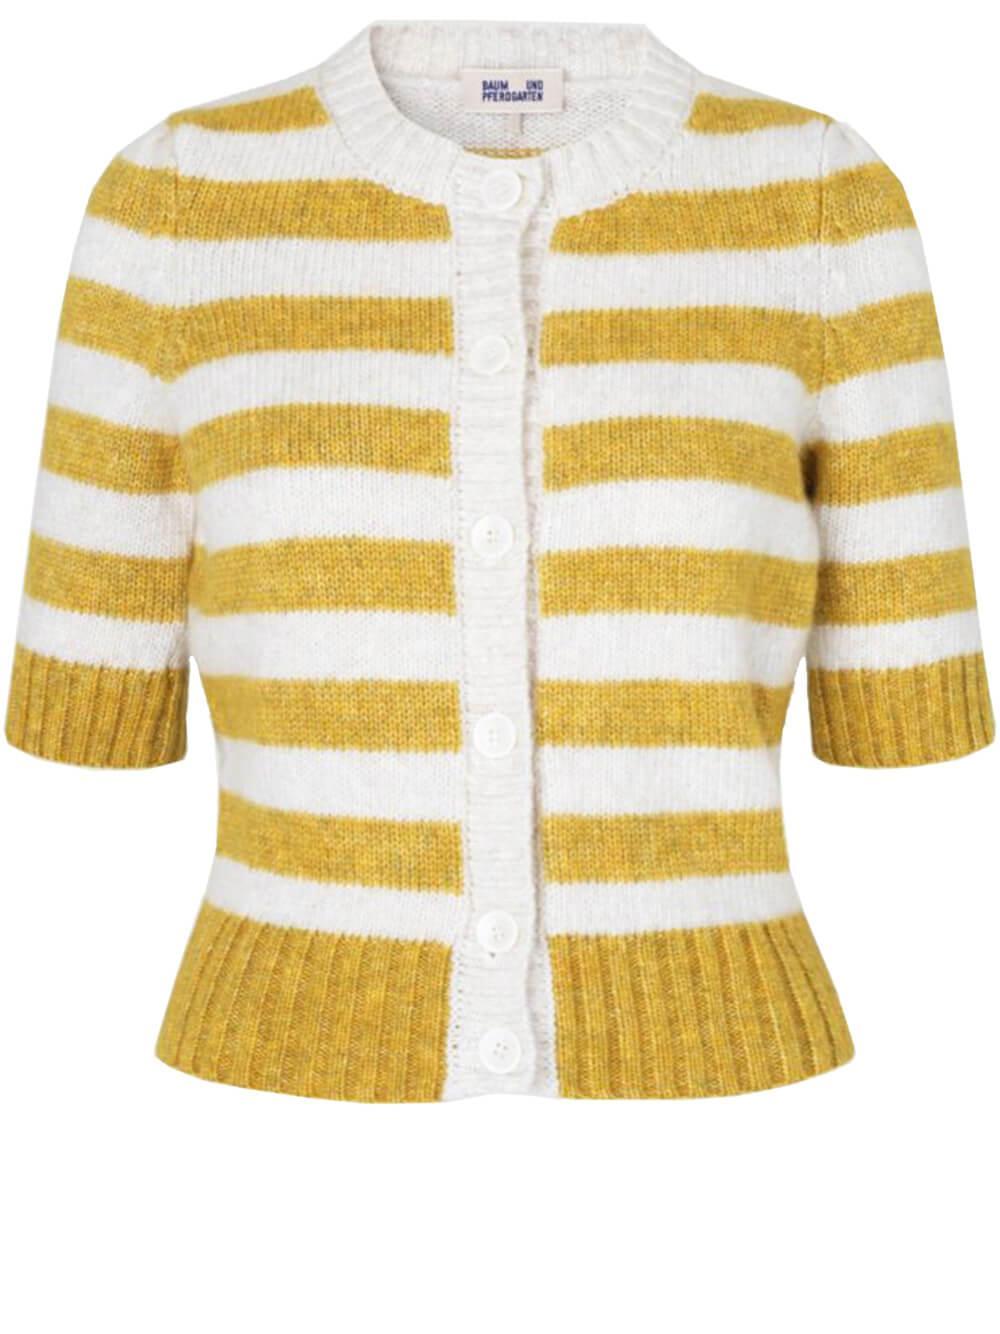 Cachay Striped Cardigan Item # 21668